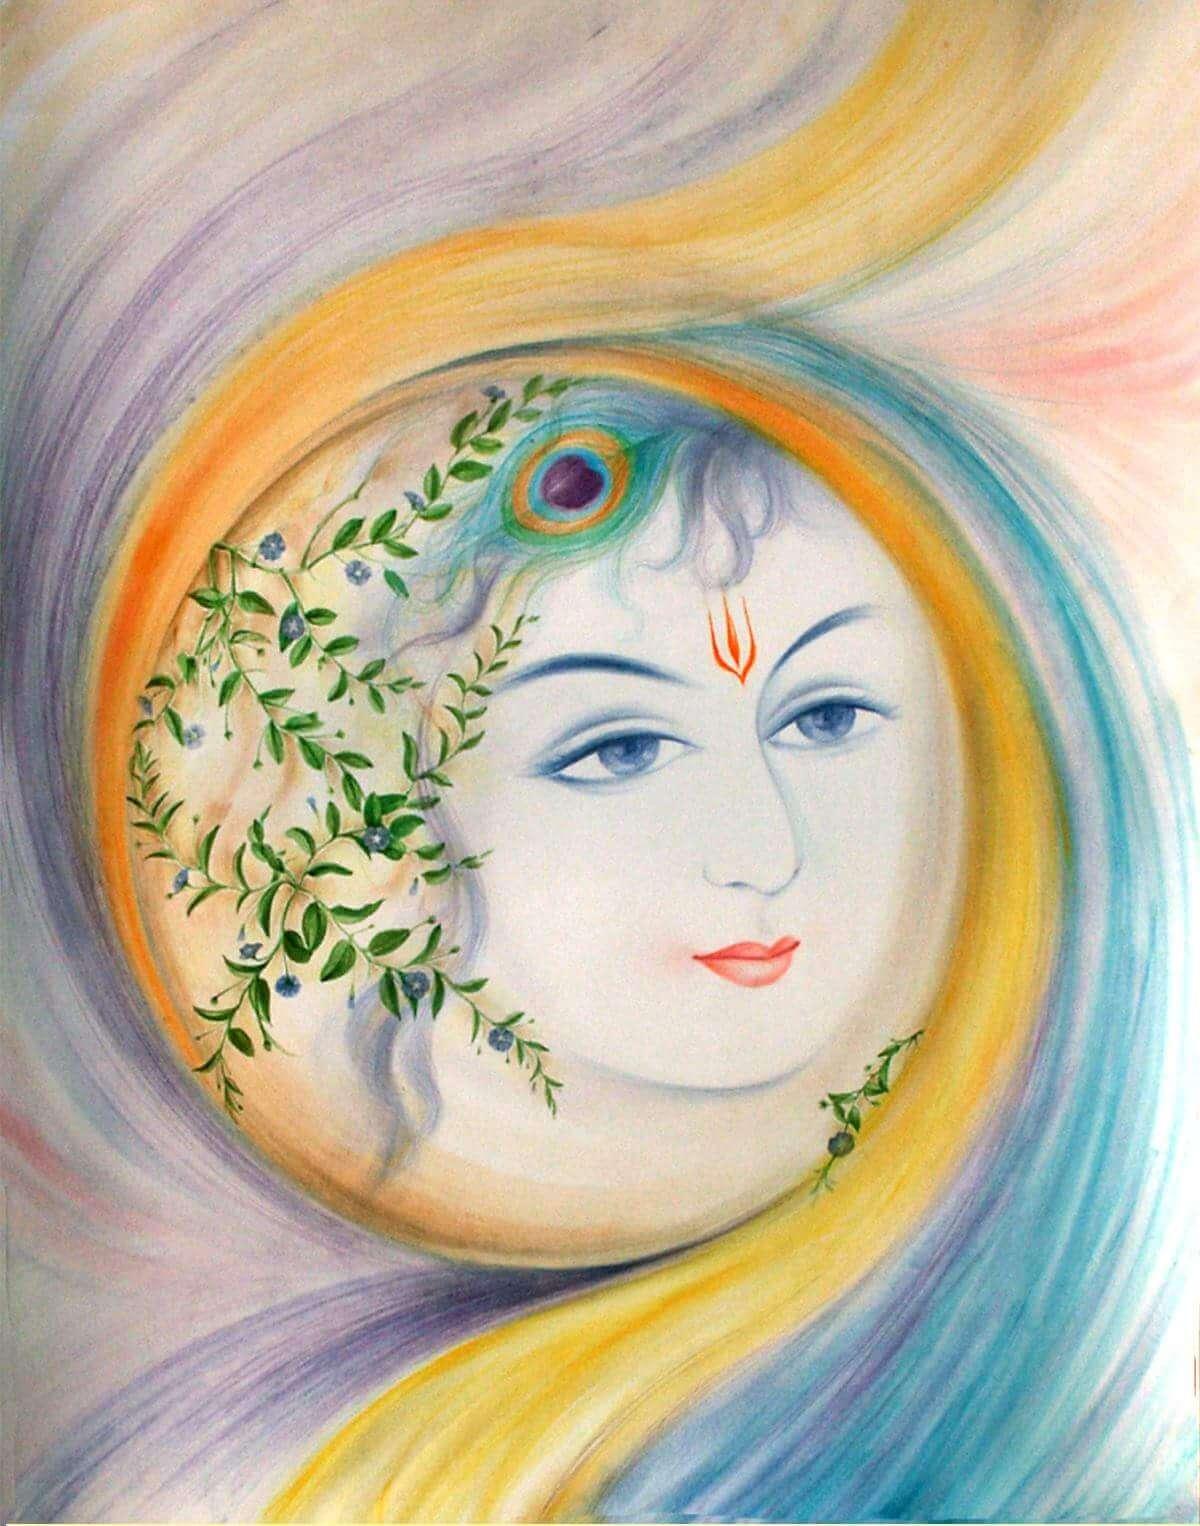 ऋतम उपाध्याय का चित्र